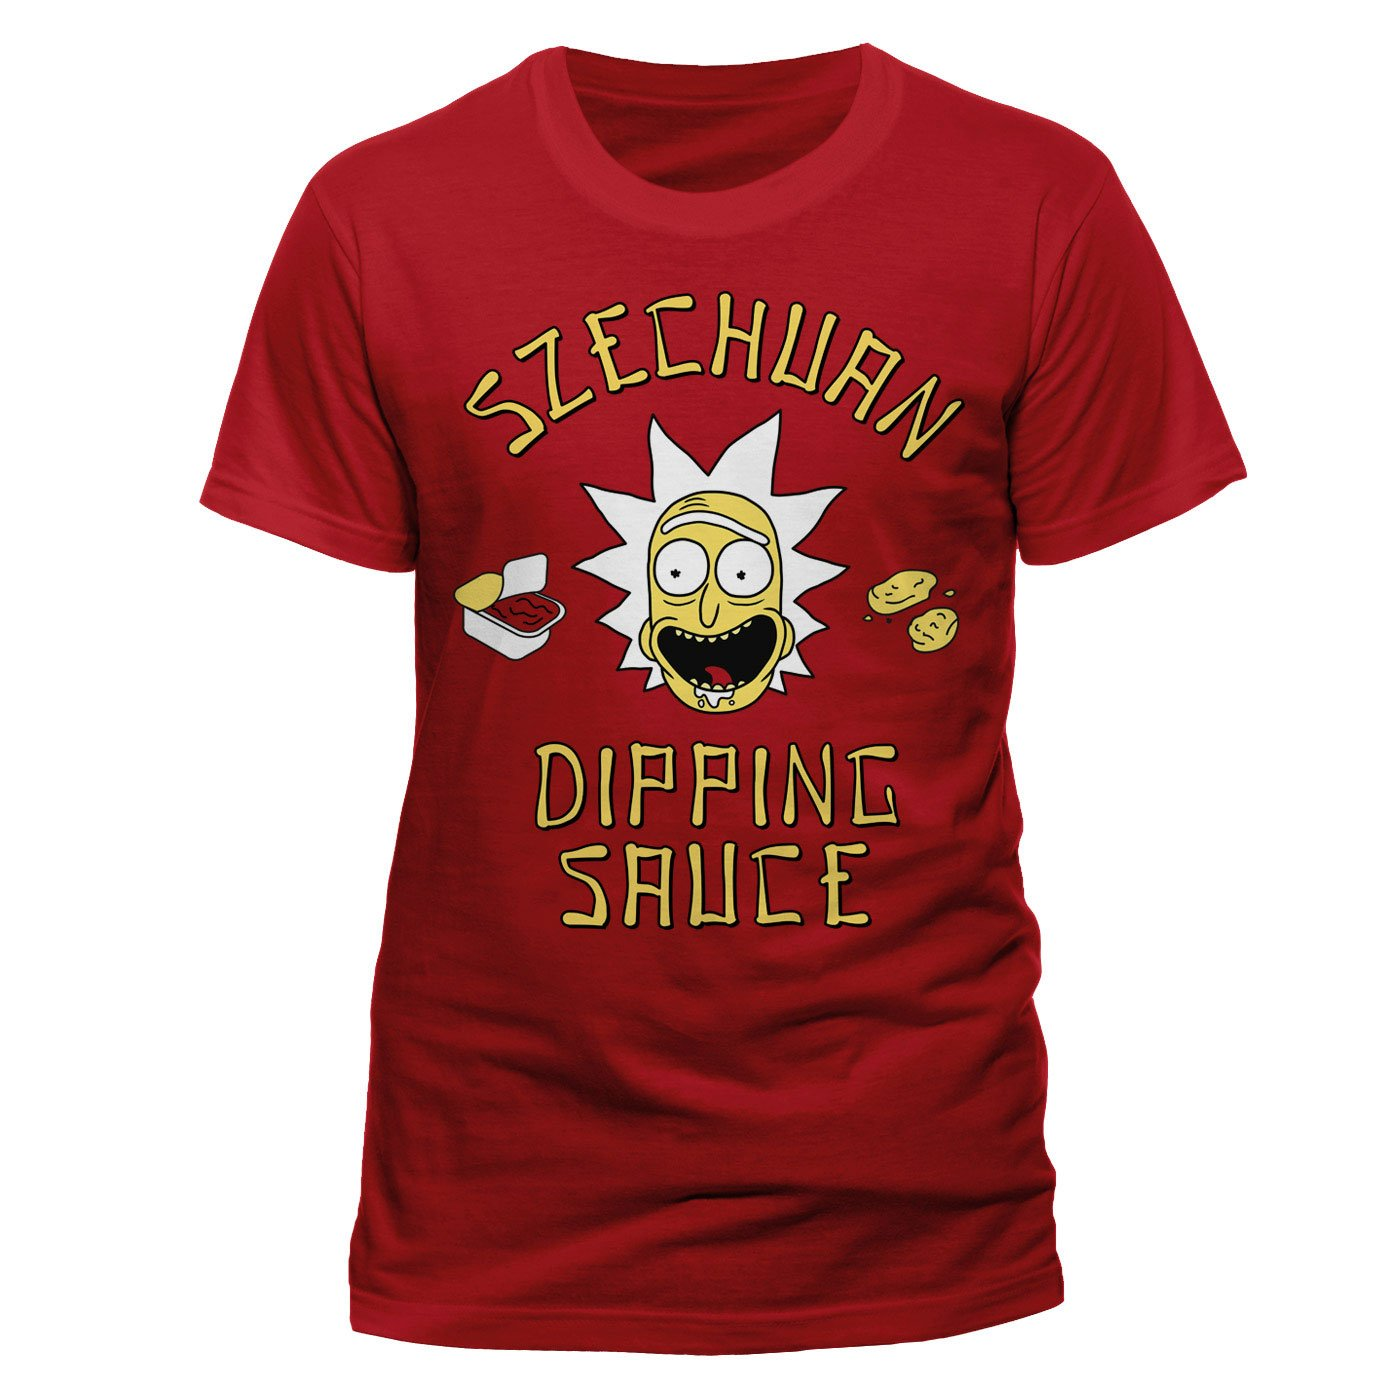 Rick and Morty T-Shirt Szechuan Dipping Sauce Size S